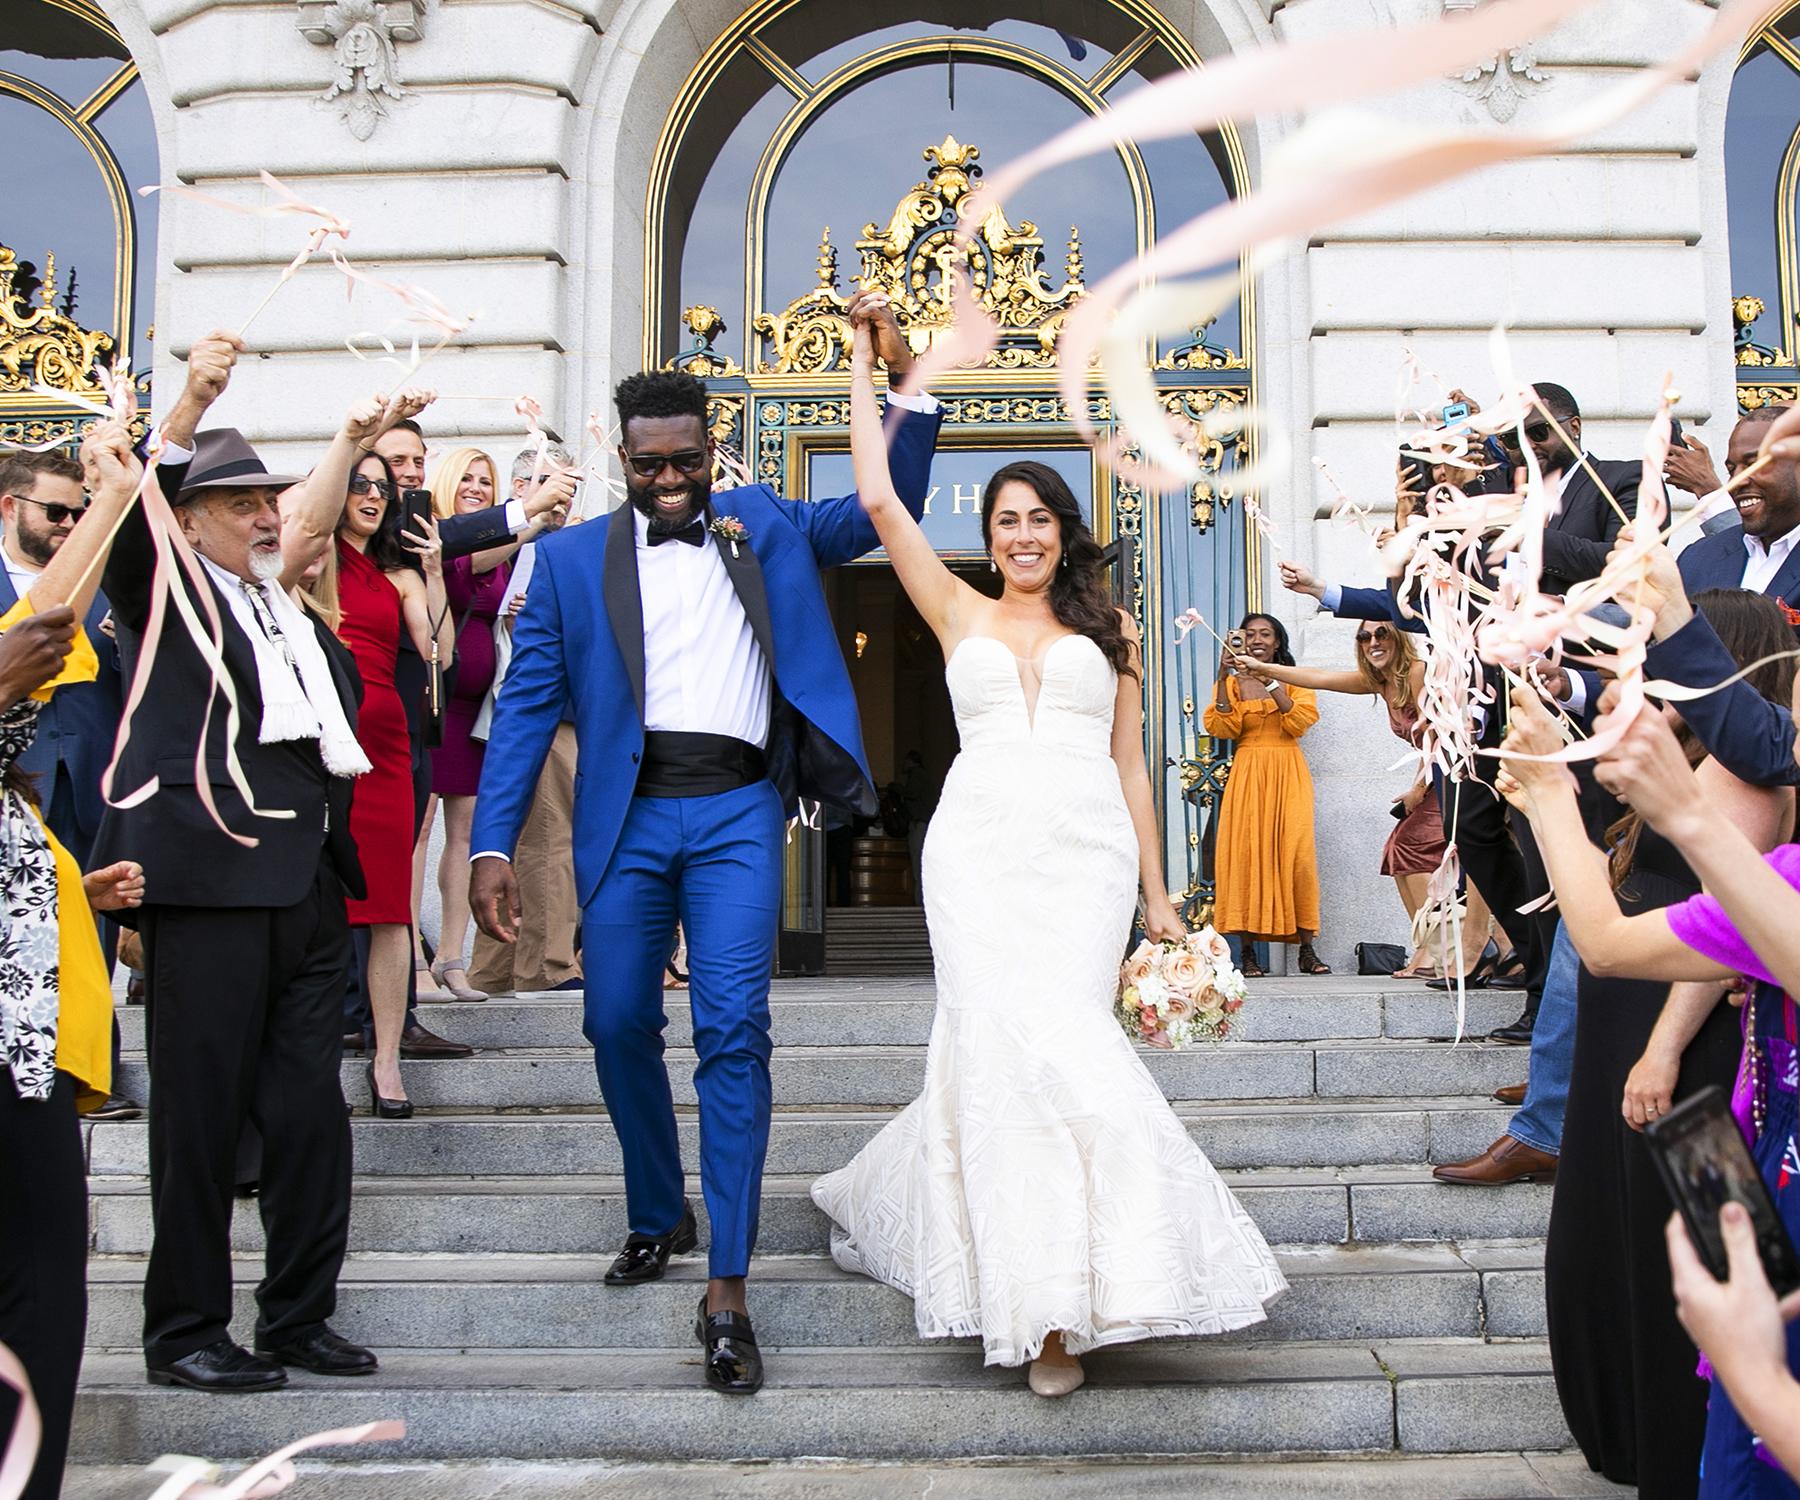 WEDDINGS & ELOPEMENTS Photography